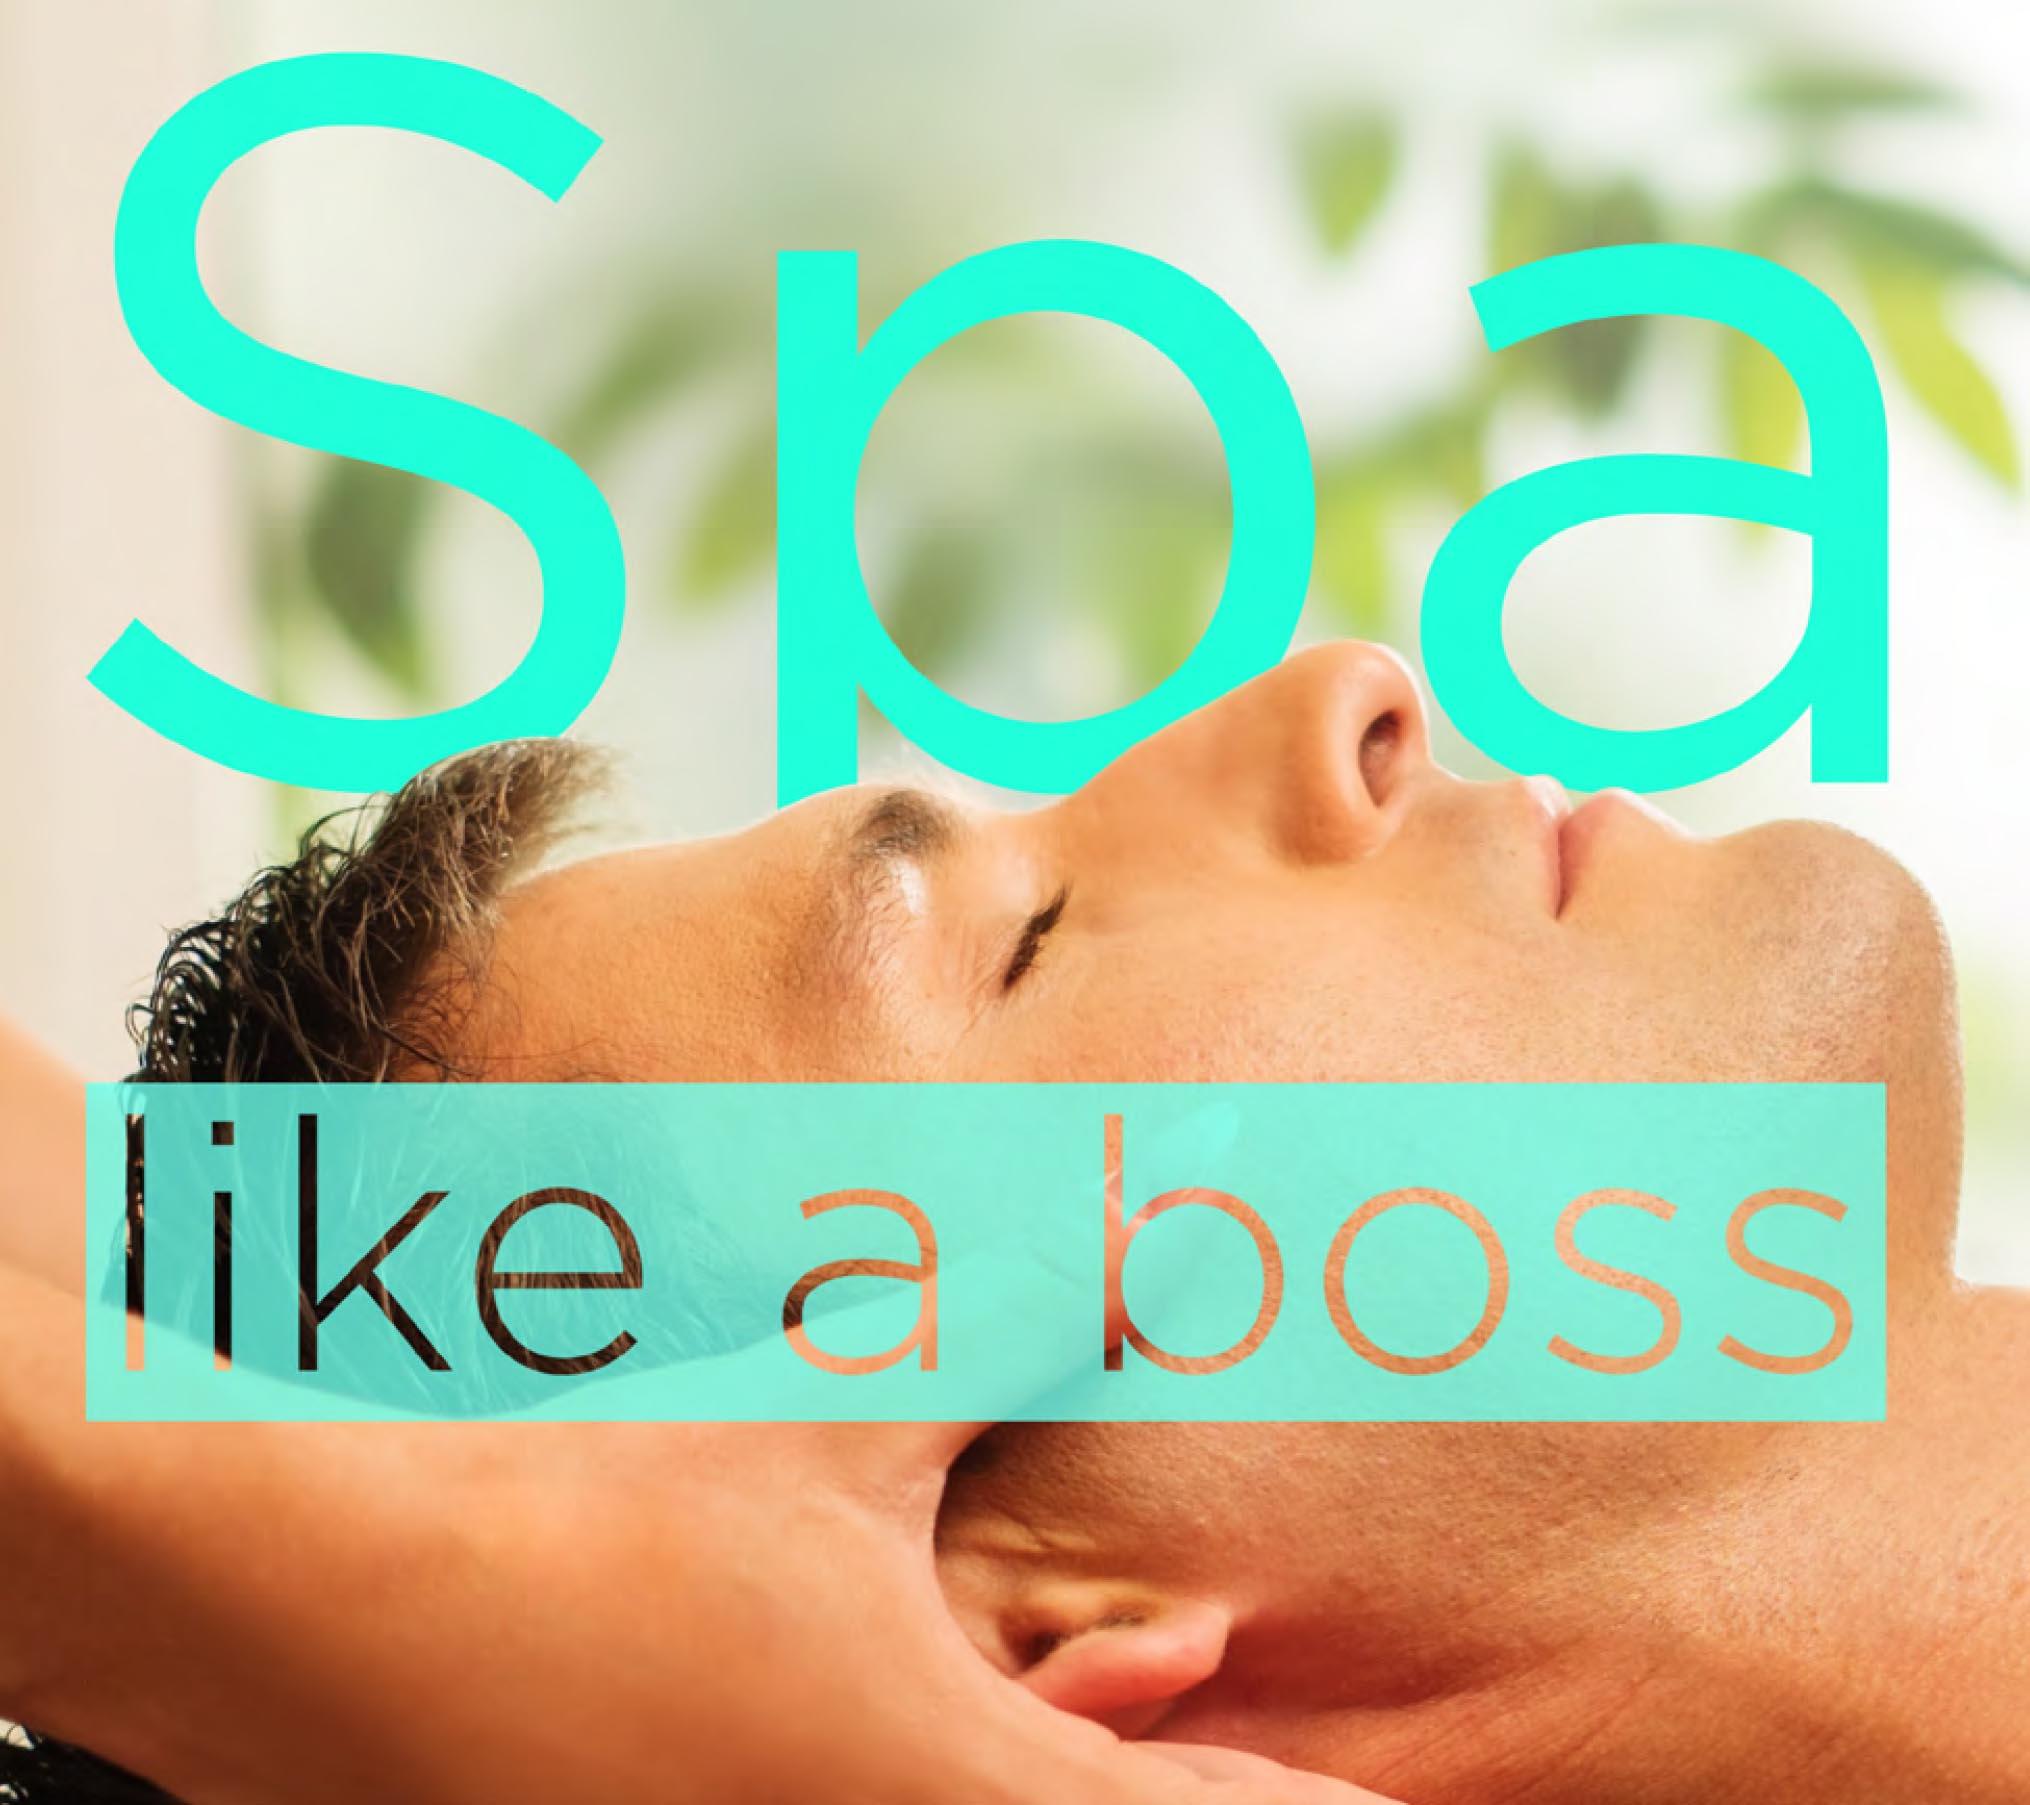 Grooming, Spa like a boss